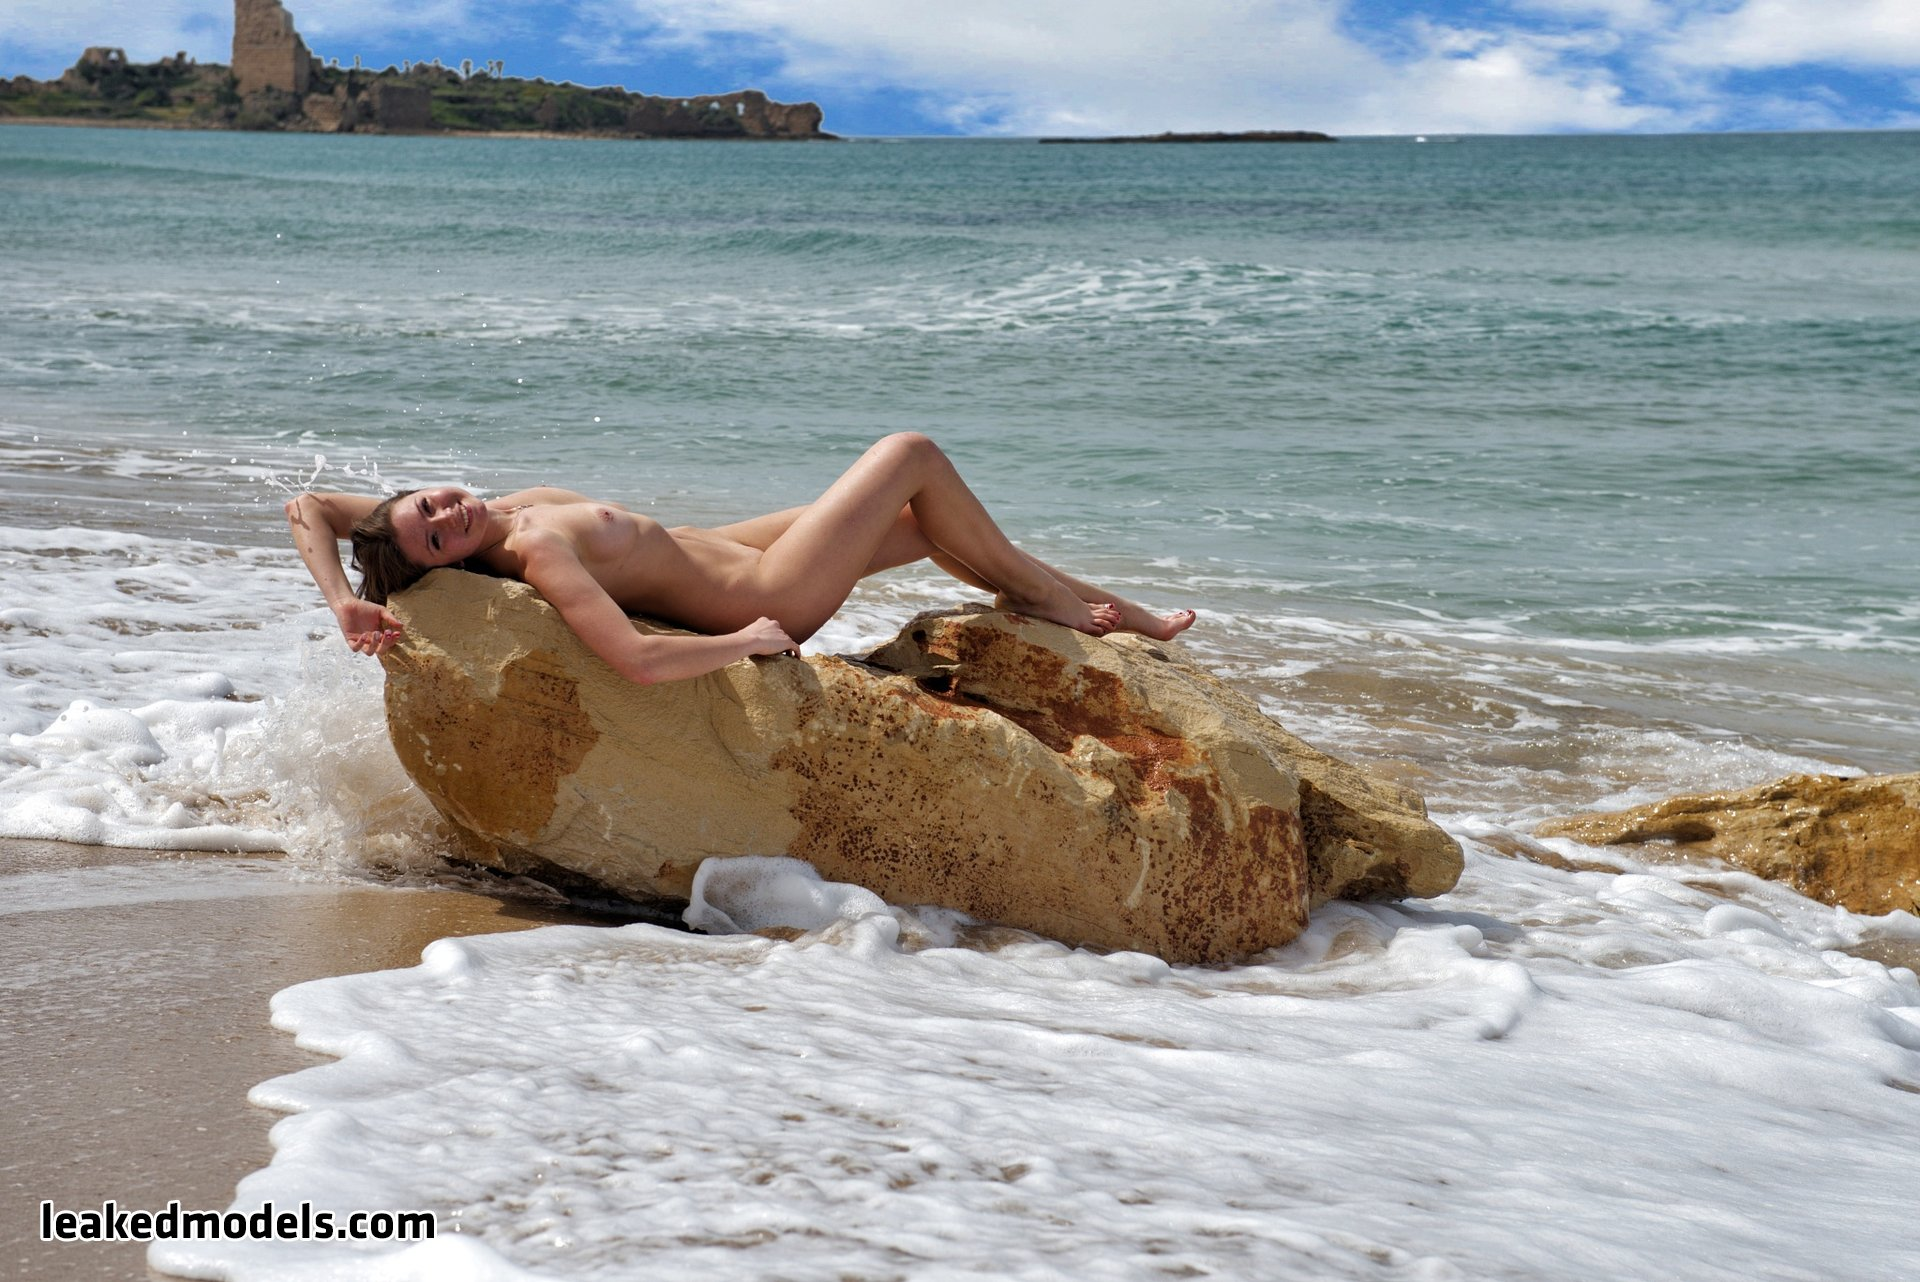 olya golubenko leaked nude leakedmodels.com 0010 - Olya Golubenko Instagram Nude Leaks (33 Photos)